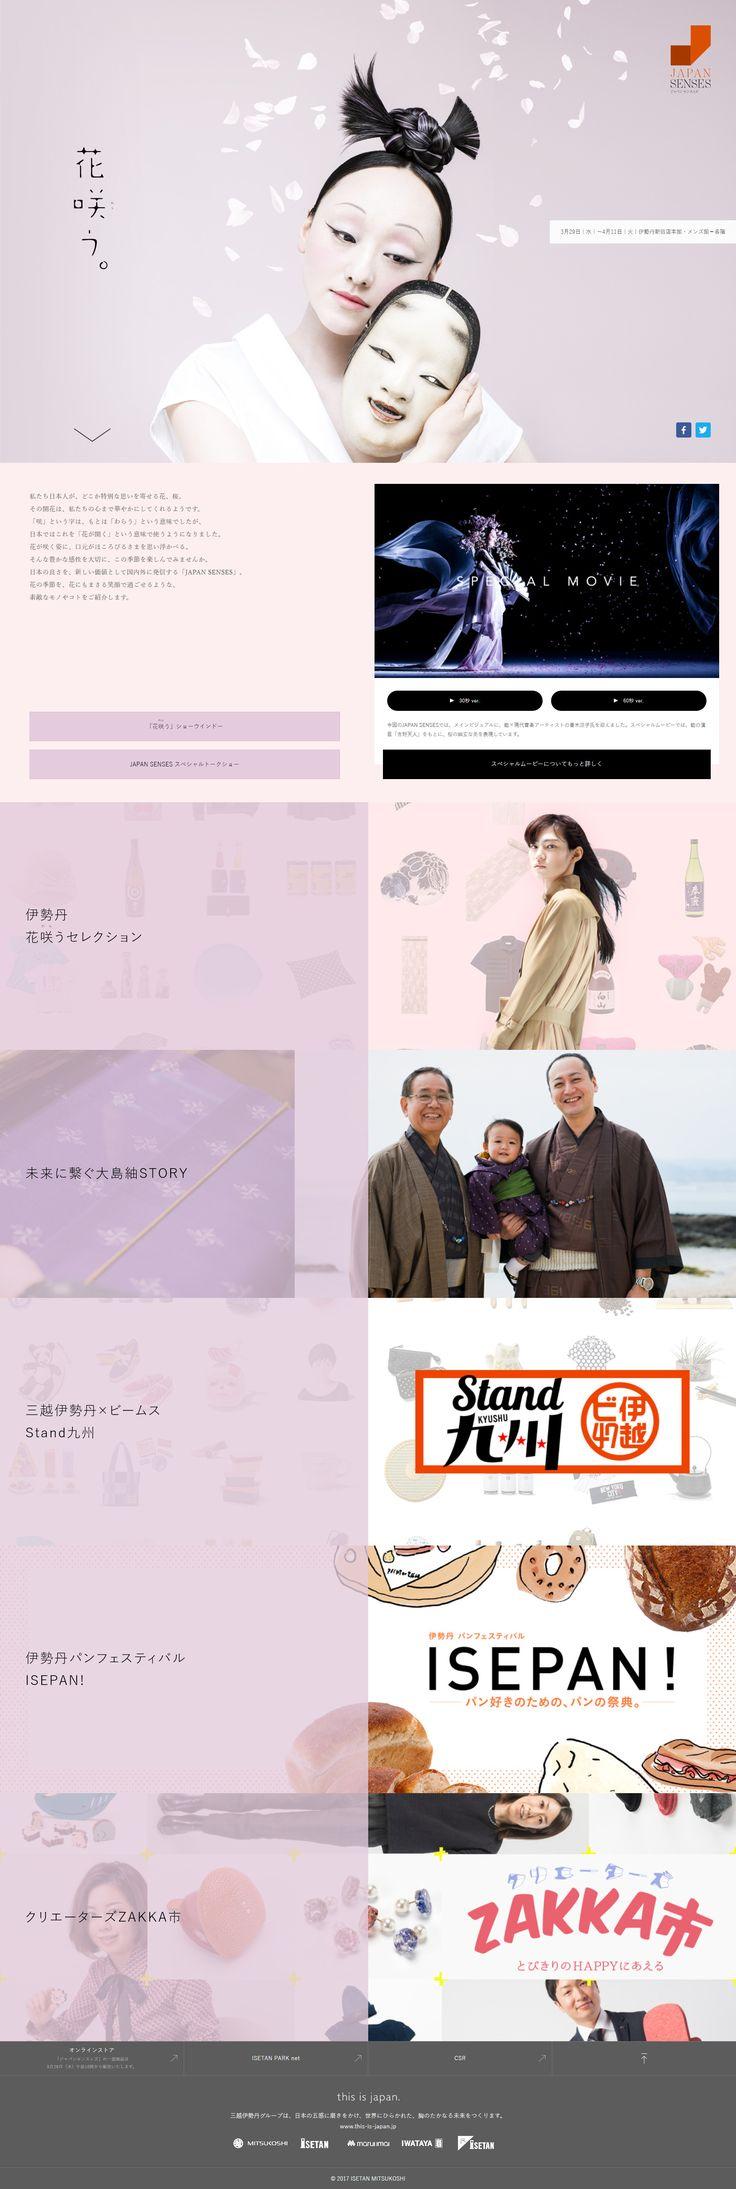 JAPAN SENSES http://cp.miguide.jp/japansenses/shinjuku/index_new.html